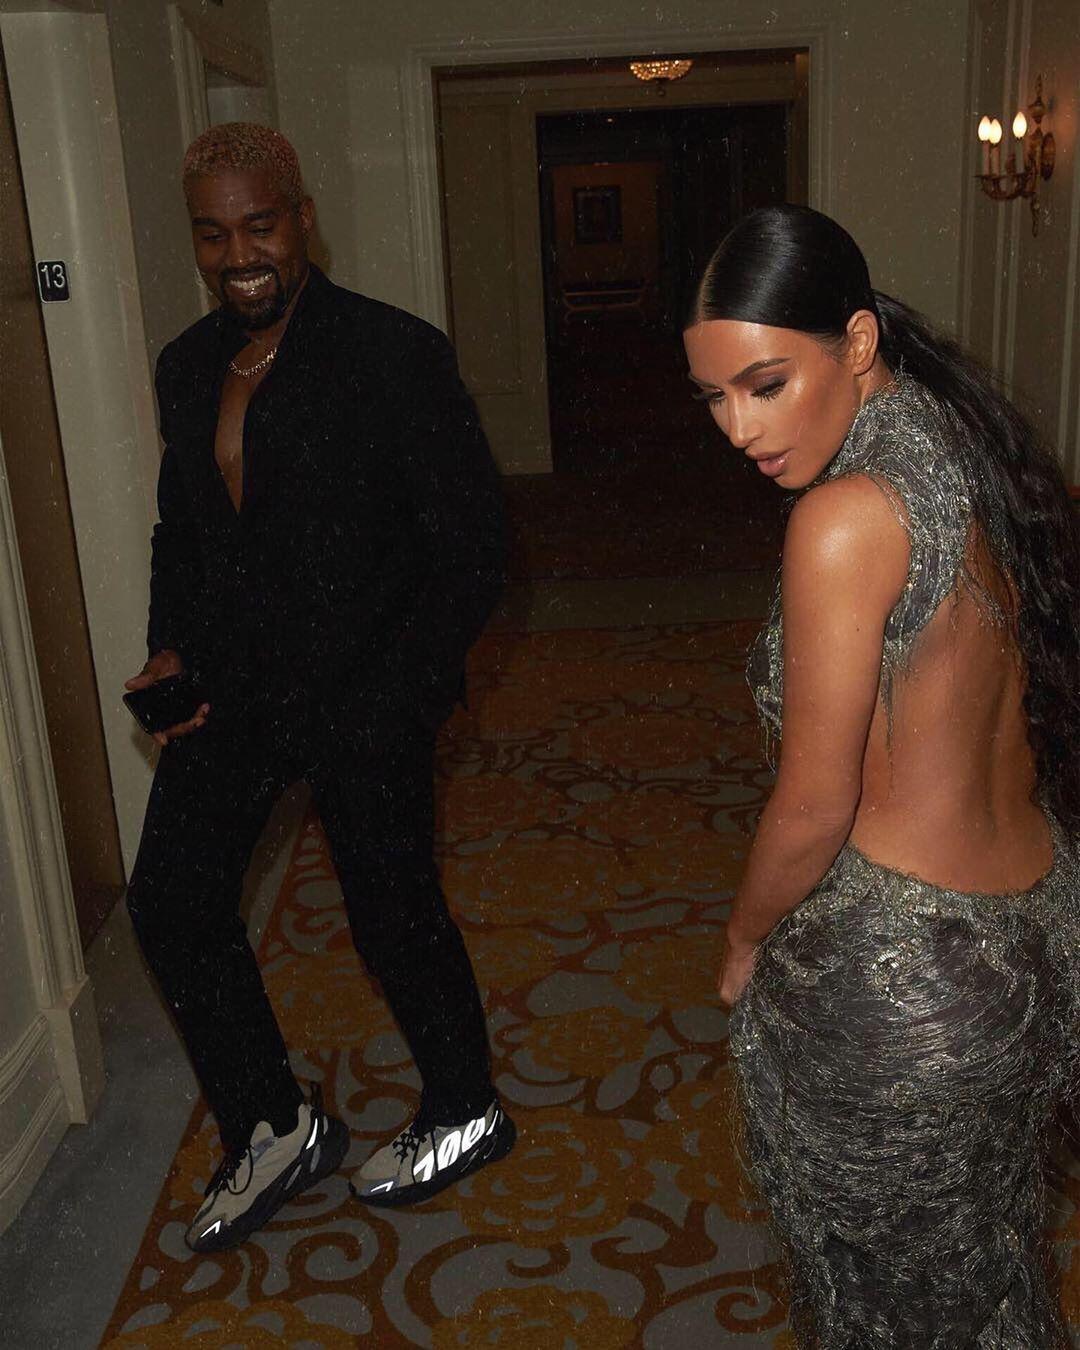 Kim Kardashian West Kimkardashian Instagram Photos And Videos Kim Kardashian Outfits Kim And Kanye Kardashian